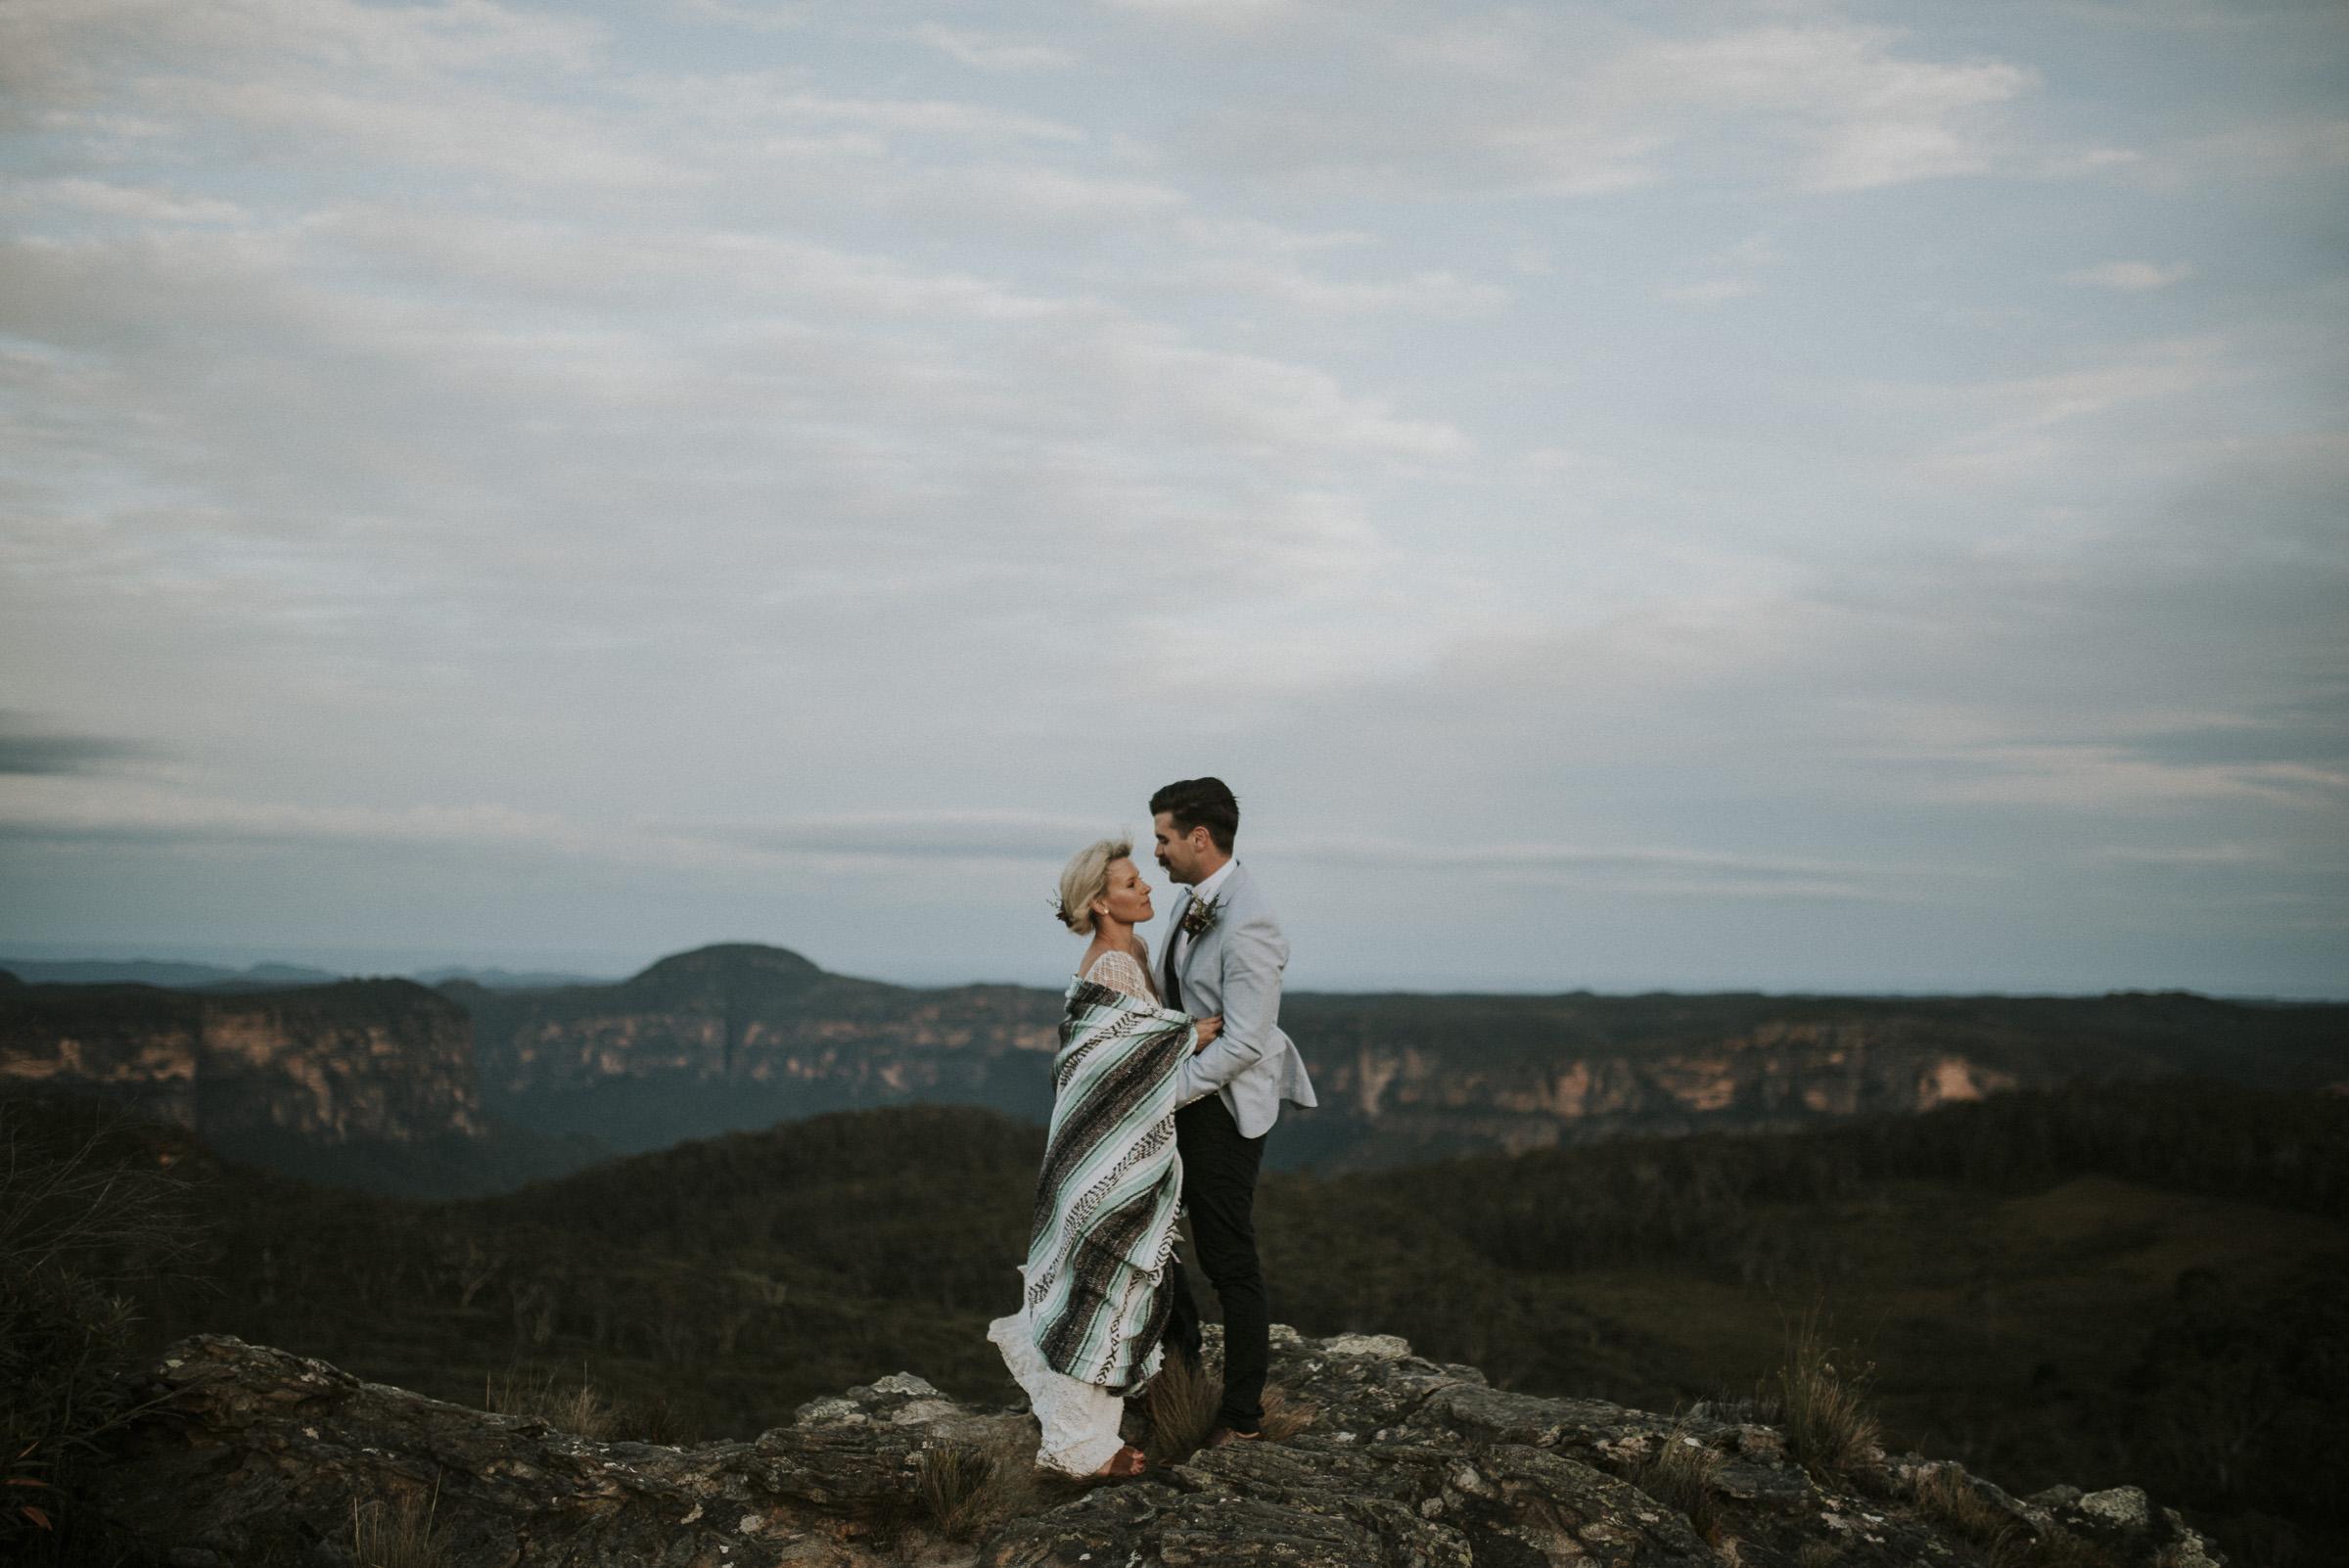 Amber_Johnny_Blue_Mountains_Elopement_Anteloping-88.jpg